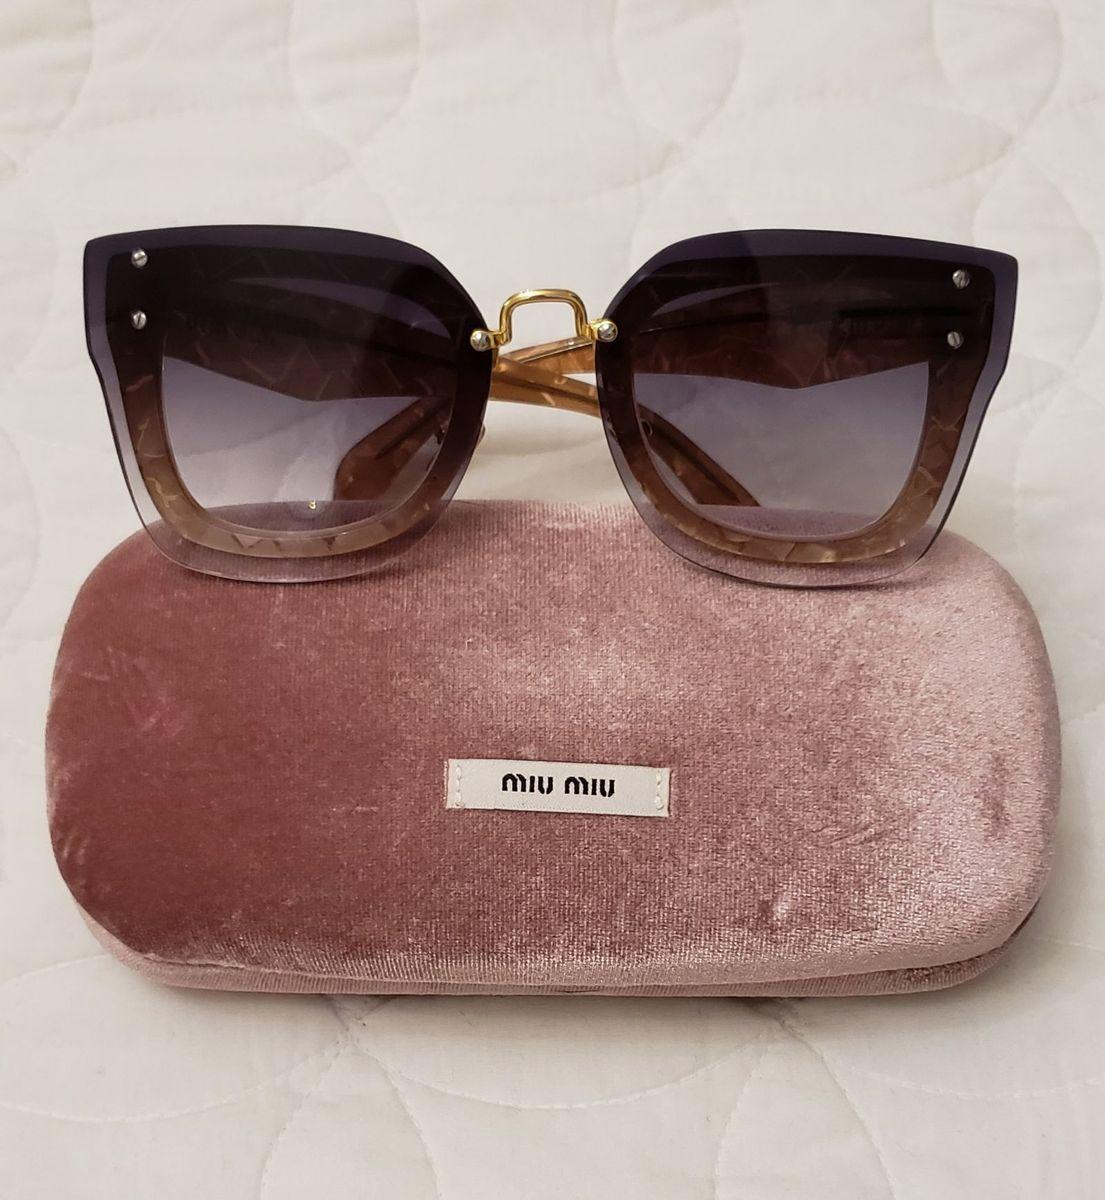 óculos de sol miu miu - óculos miu-miu.  Czm6ly9wag90b3muzw5qb2vplmnvbs5ici9wcm9kdwn0cy81otexmda5lzk3owqyzgmyoda1odg1ymy0odhinwi5ndbkmmu2mzzllmpwzw  ... 87196556b9